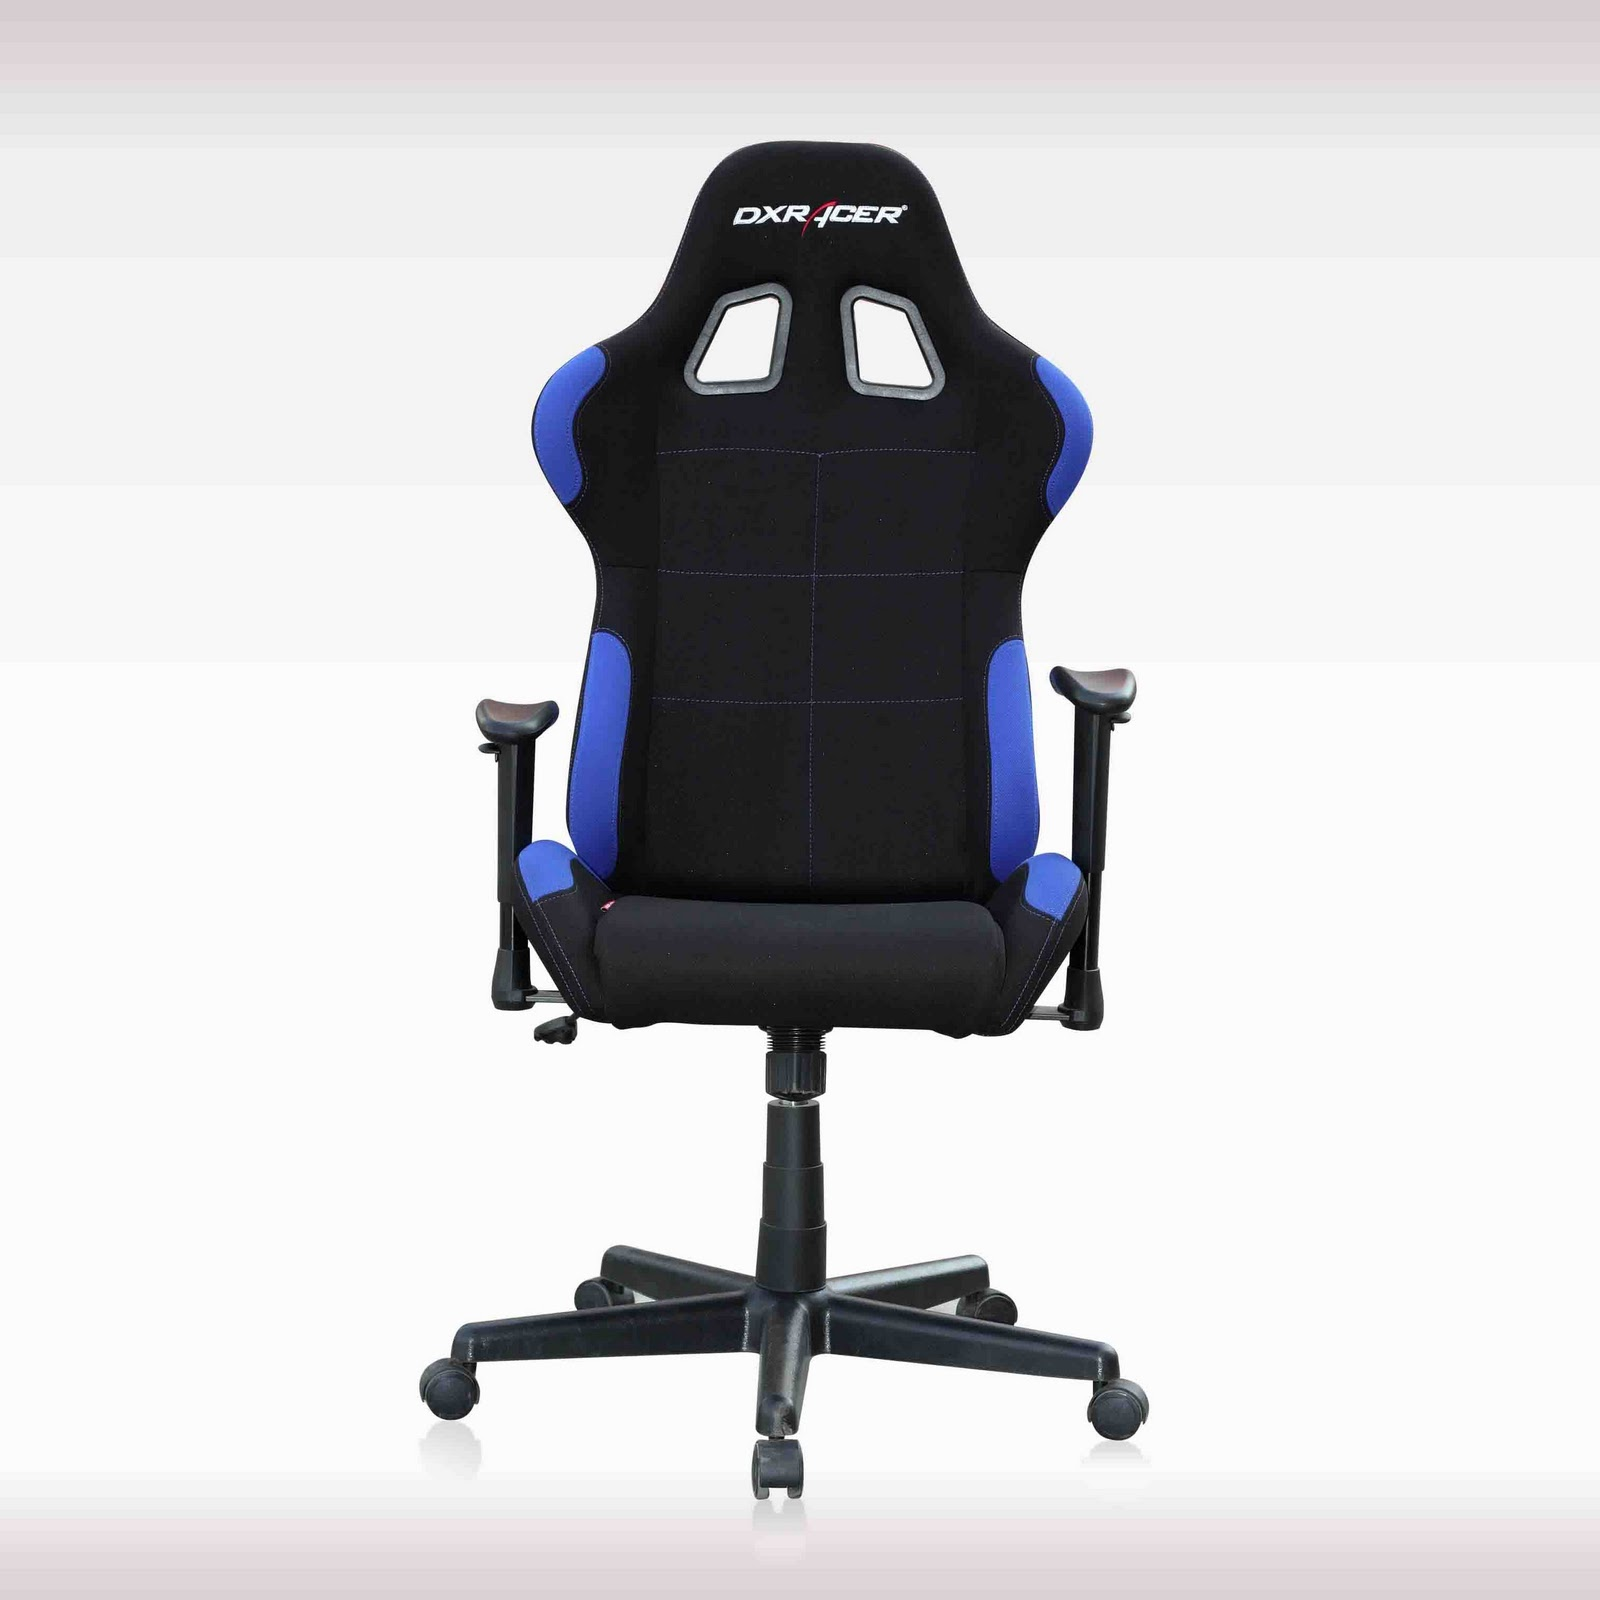 dxracer chair cover stools walmart ajshoppinghub